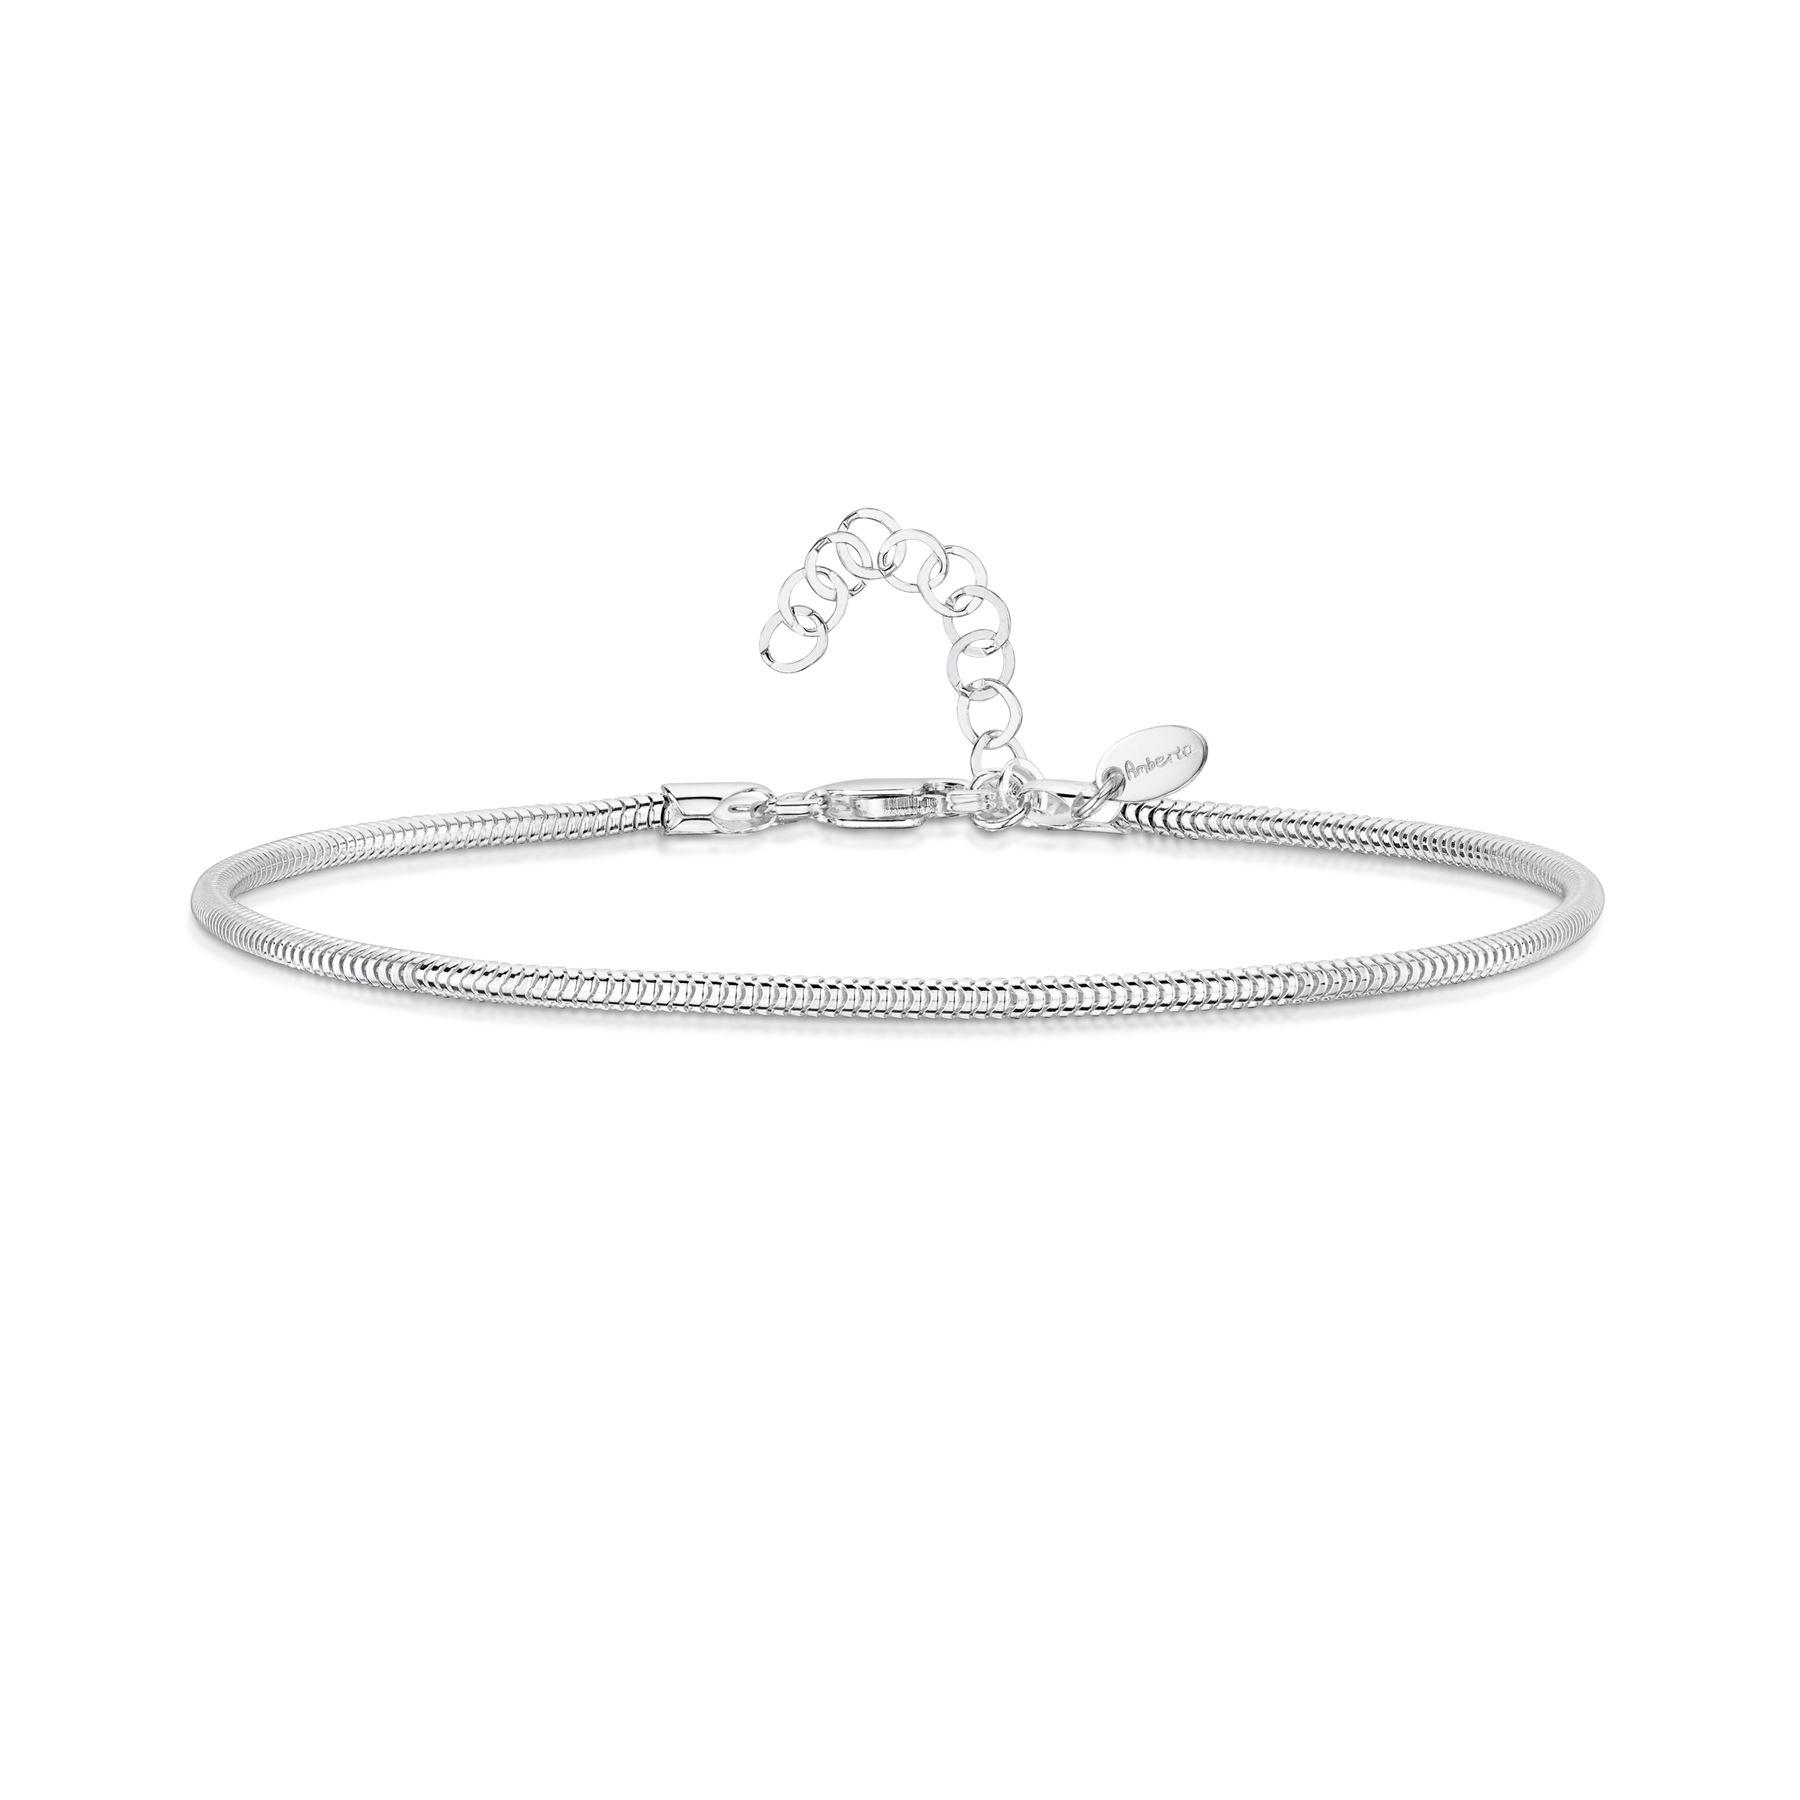 Amberta-Jewelry-925-Sterling-Silver-Adjustable-Anklet-Foot-Bracelet-for-Women miniature 29